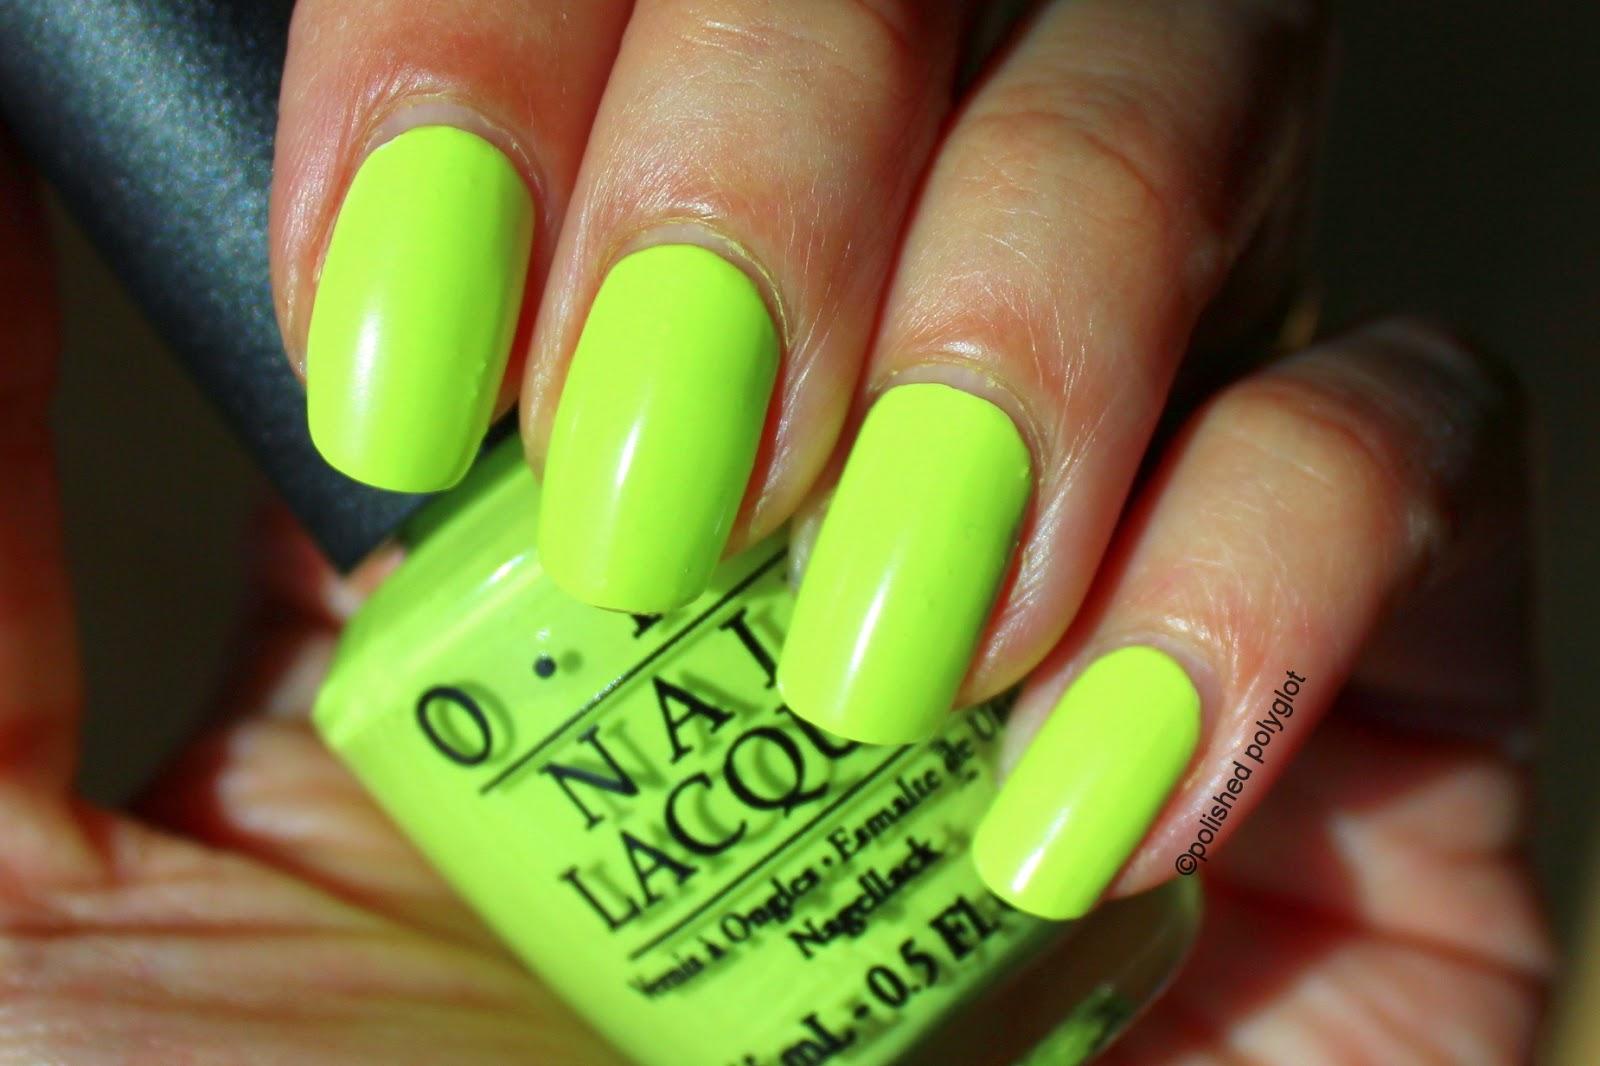 Neon Green Nail Polish Opi - Creative Touch